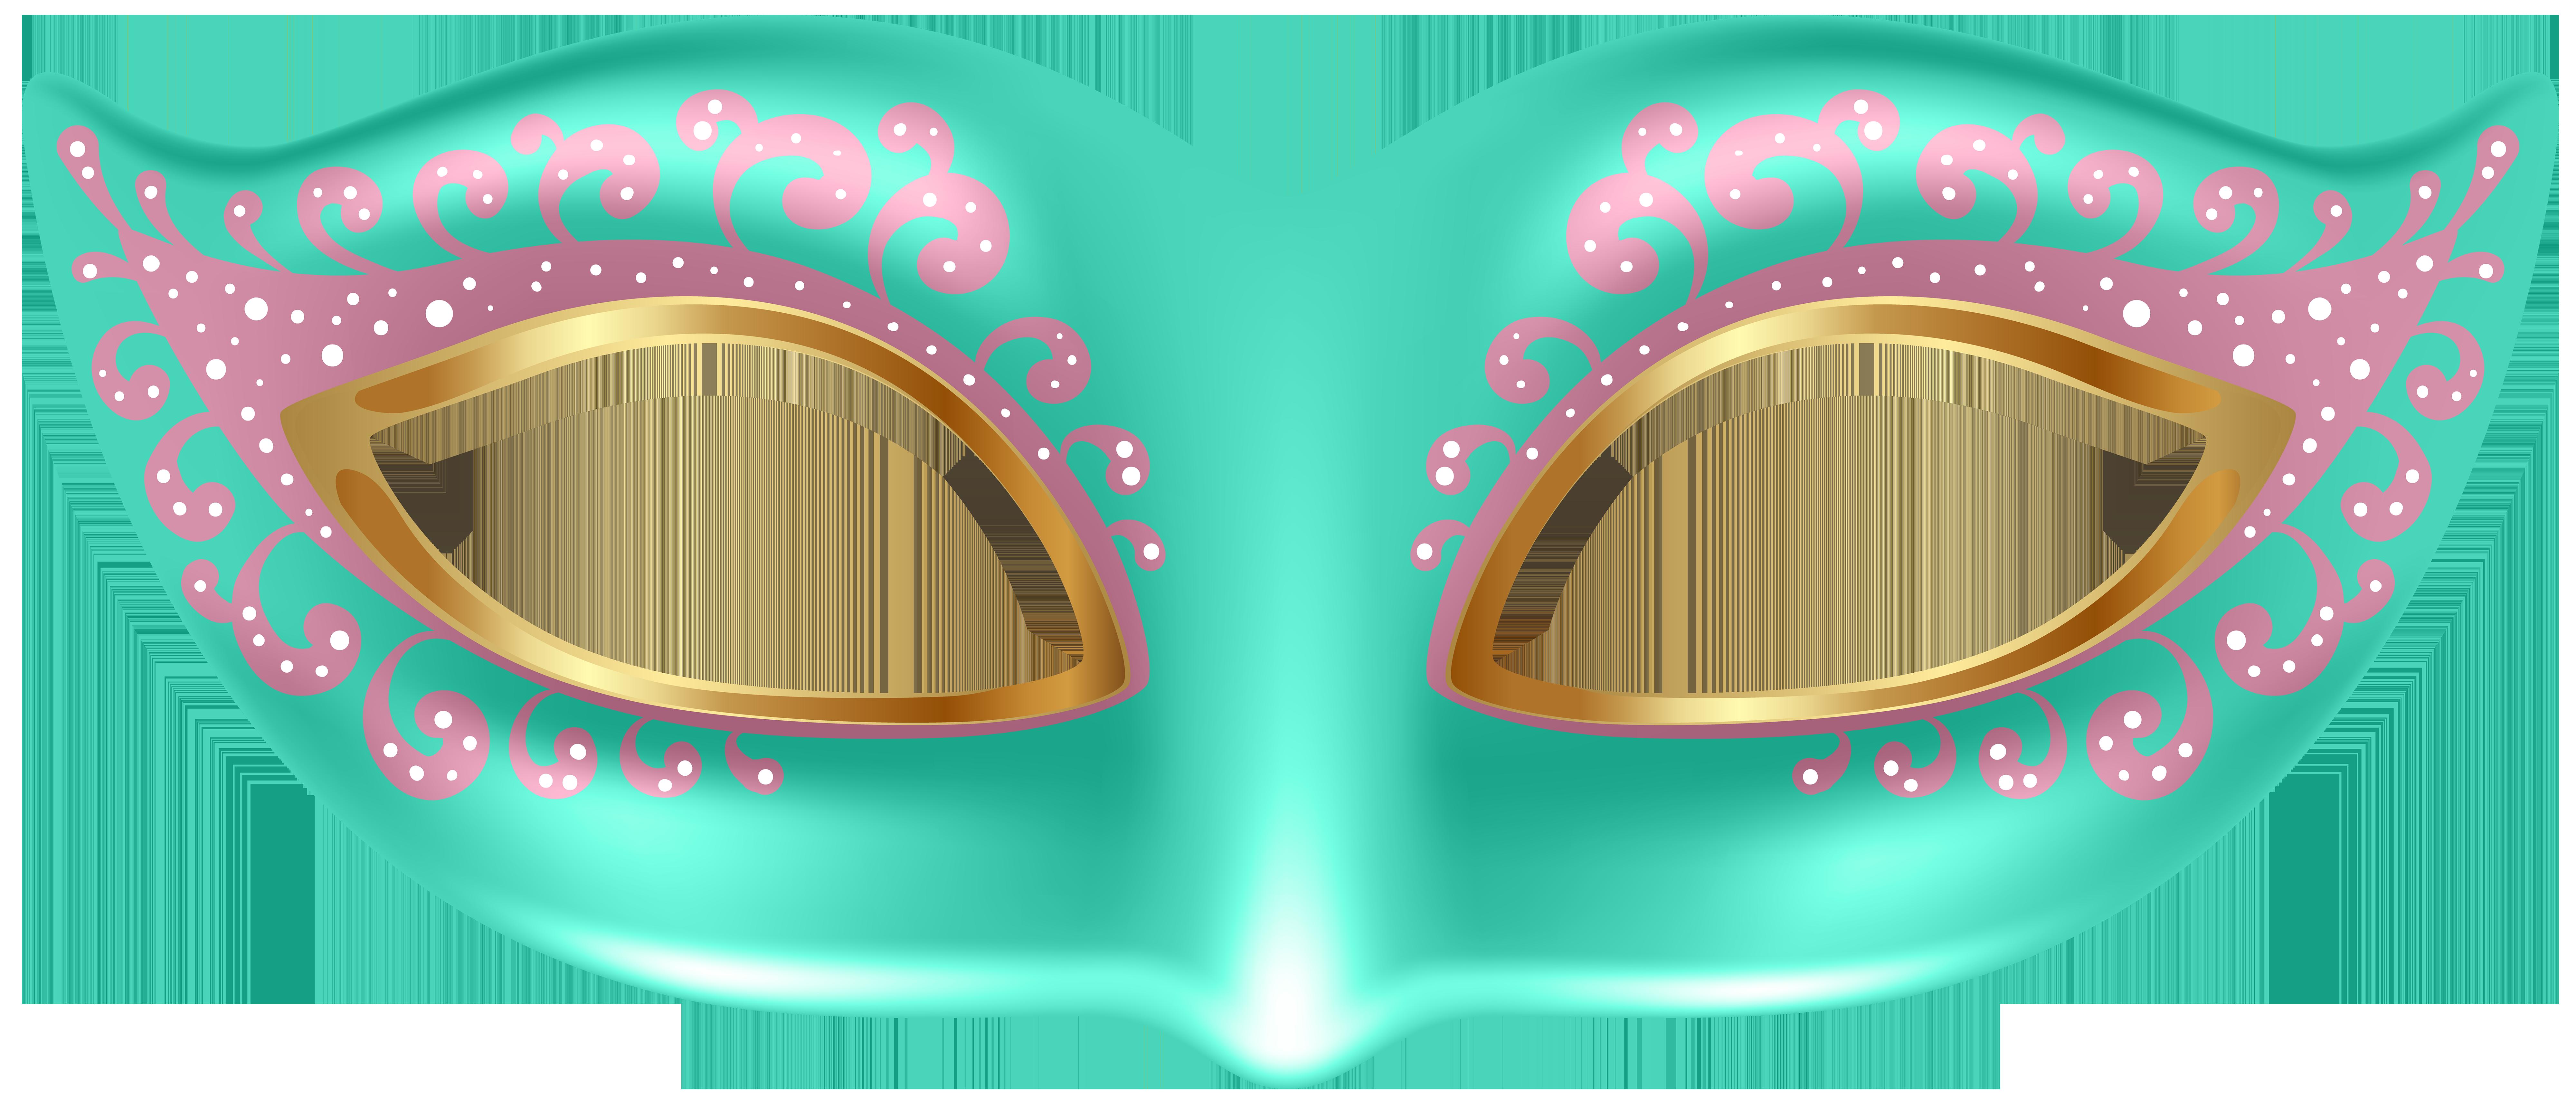 8000x3441 Mask Transparent Png Clip Art Imageu200b Gallery Yopriceville